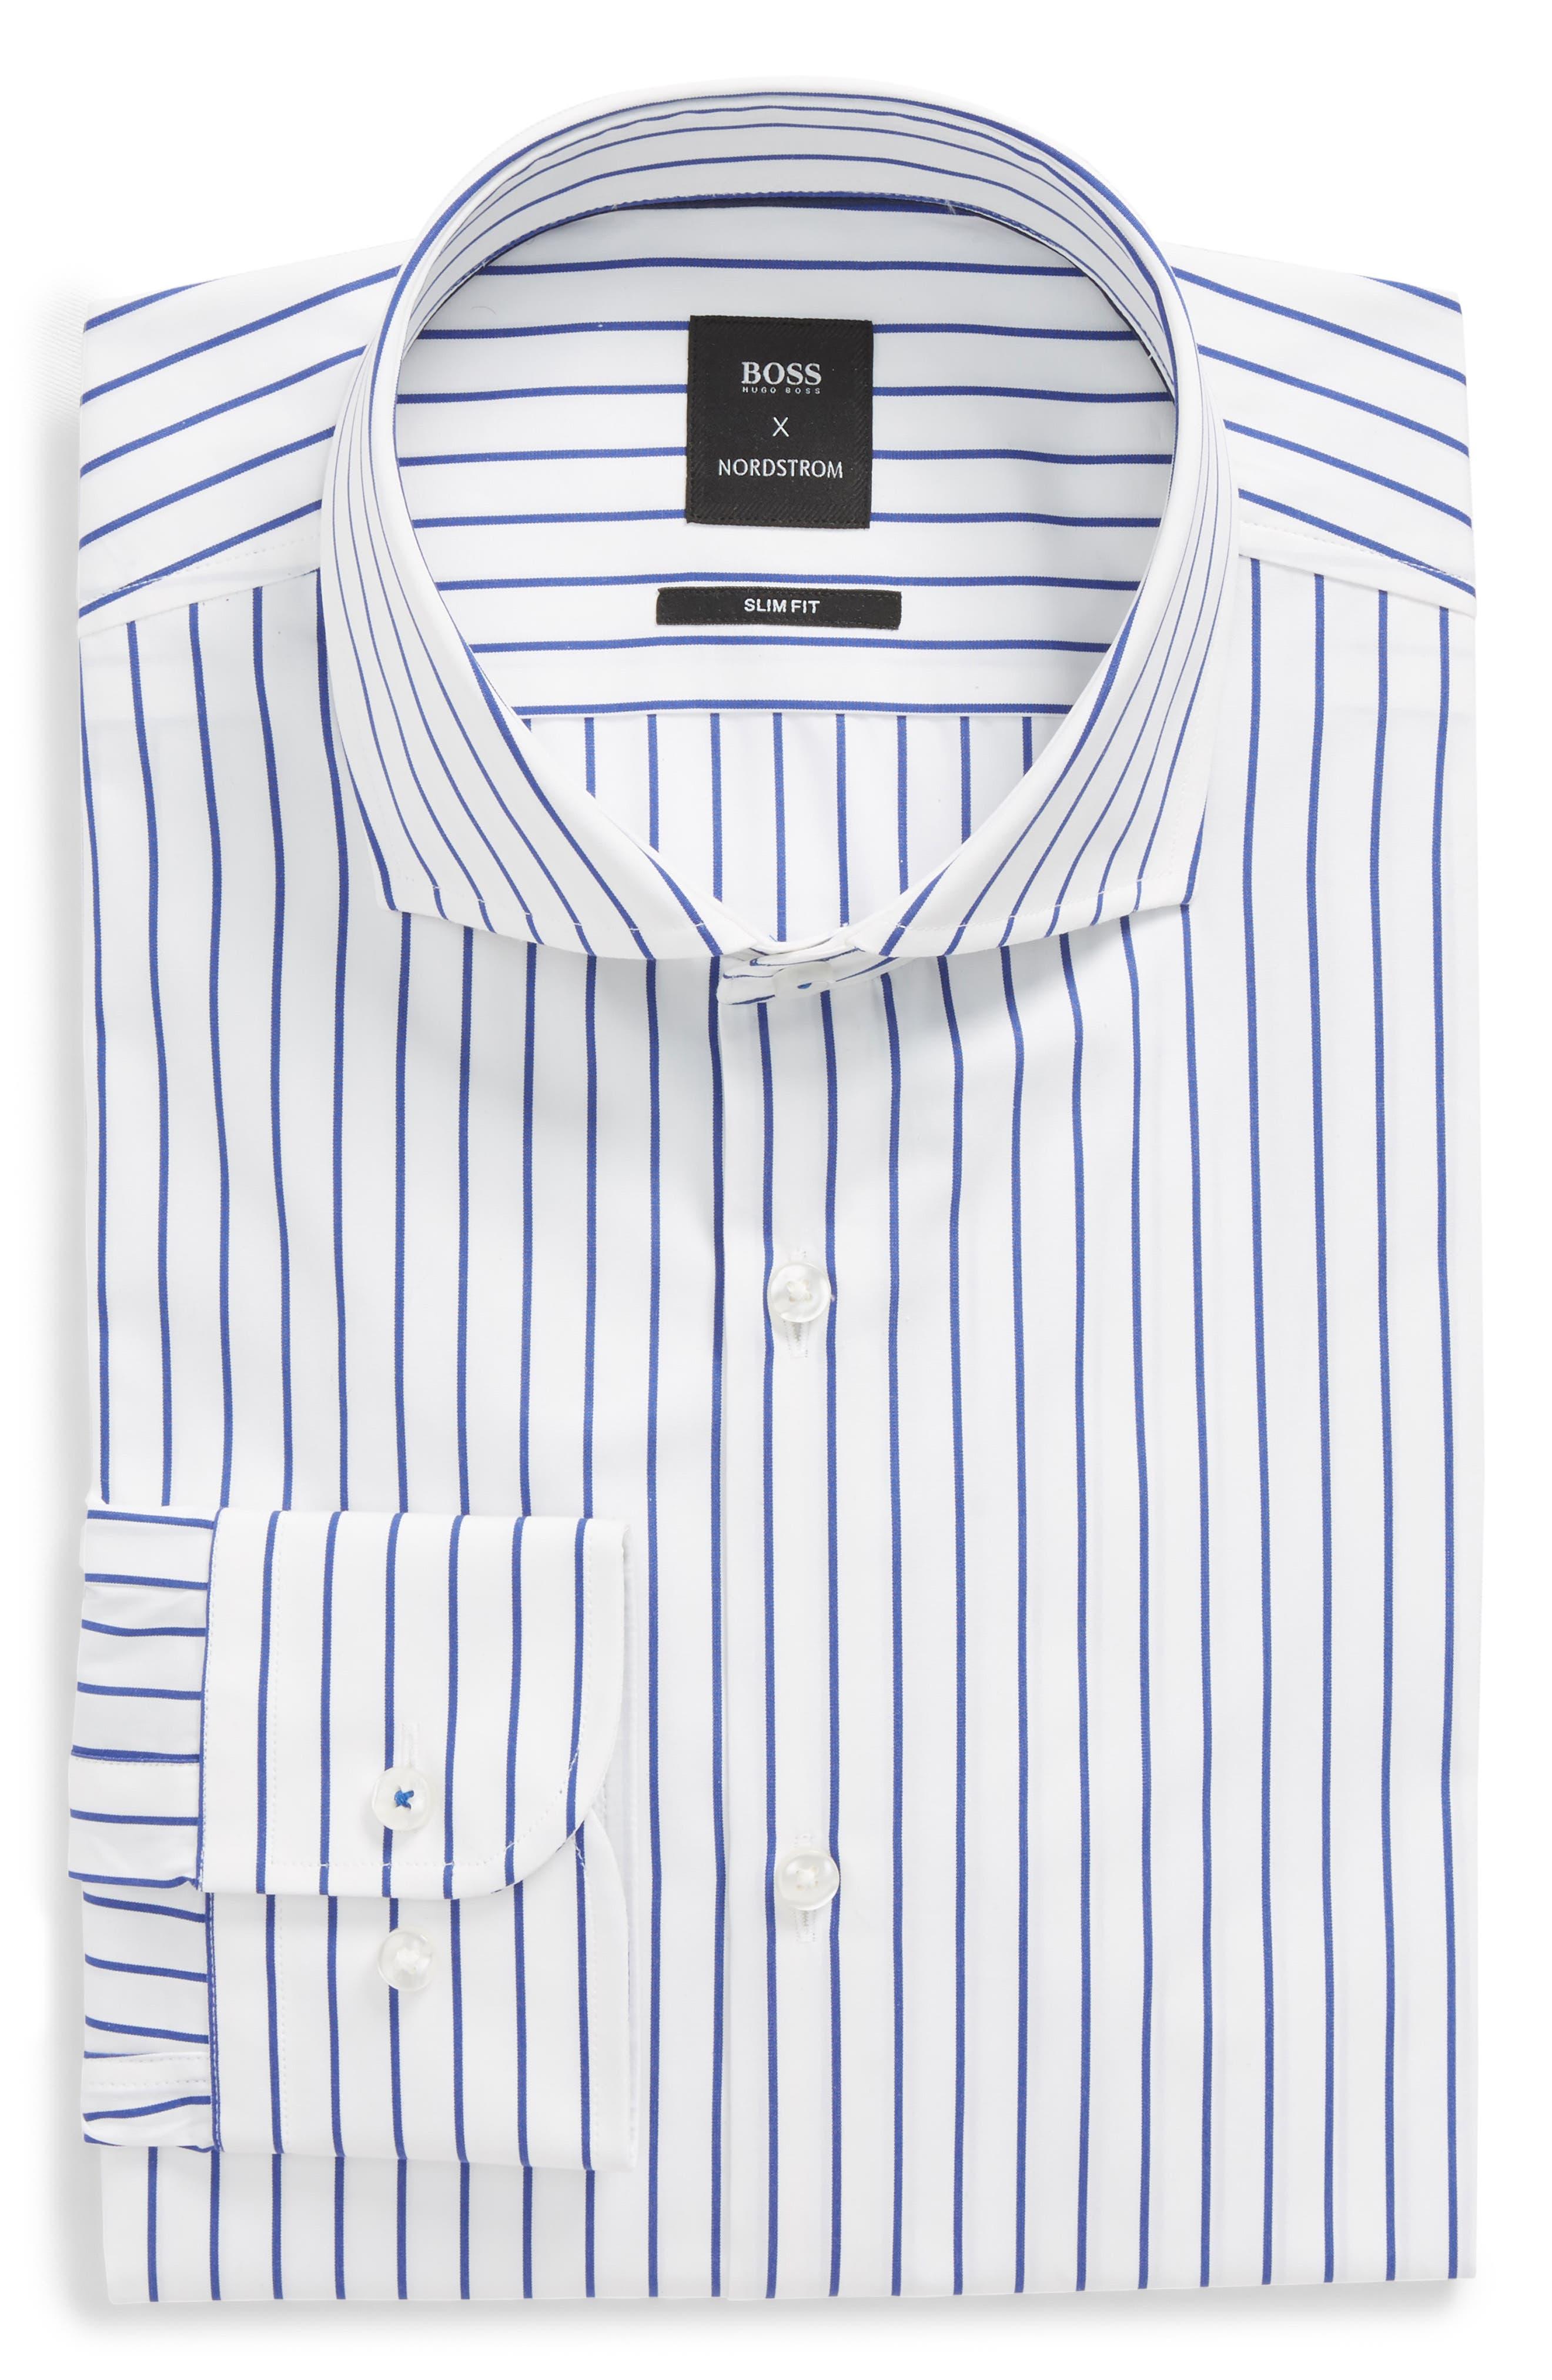 Nordstrom x BOSS Jerrin Slim Fit Stripe Dress Shirt,                             Main thumbnail 1, color,                             Blue